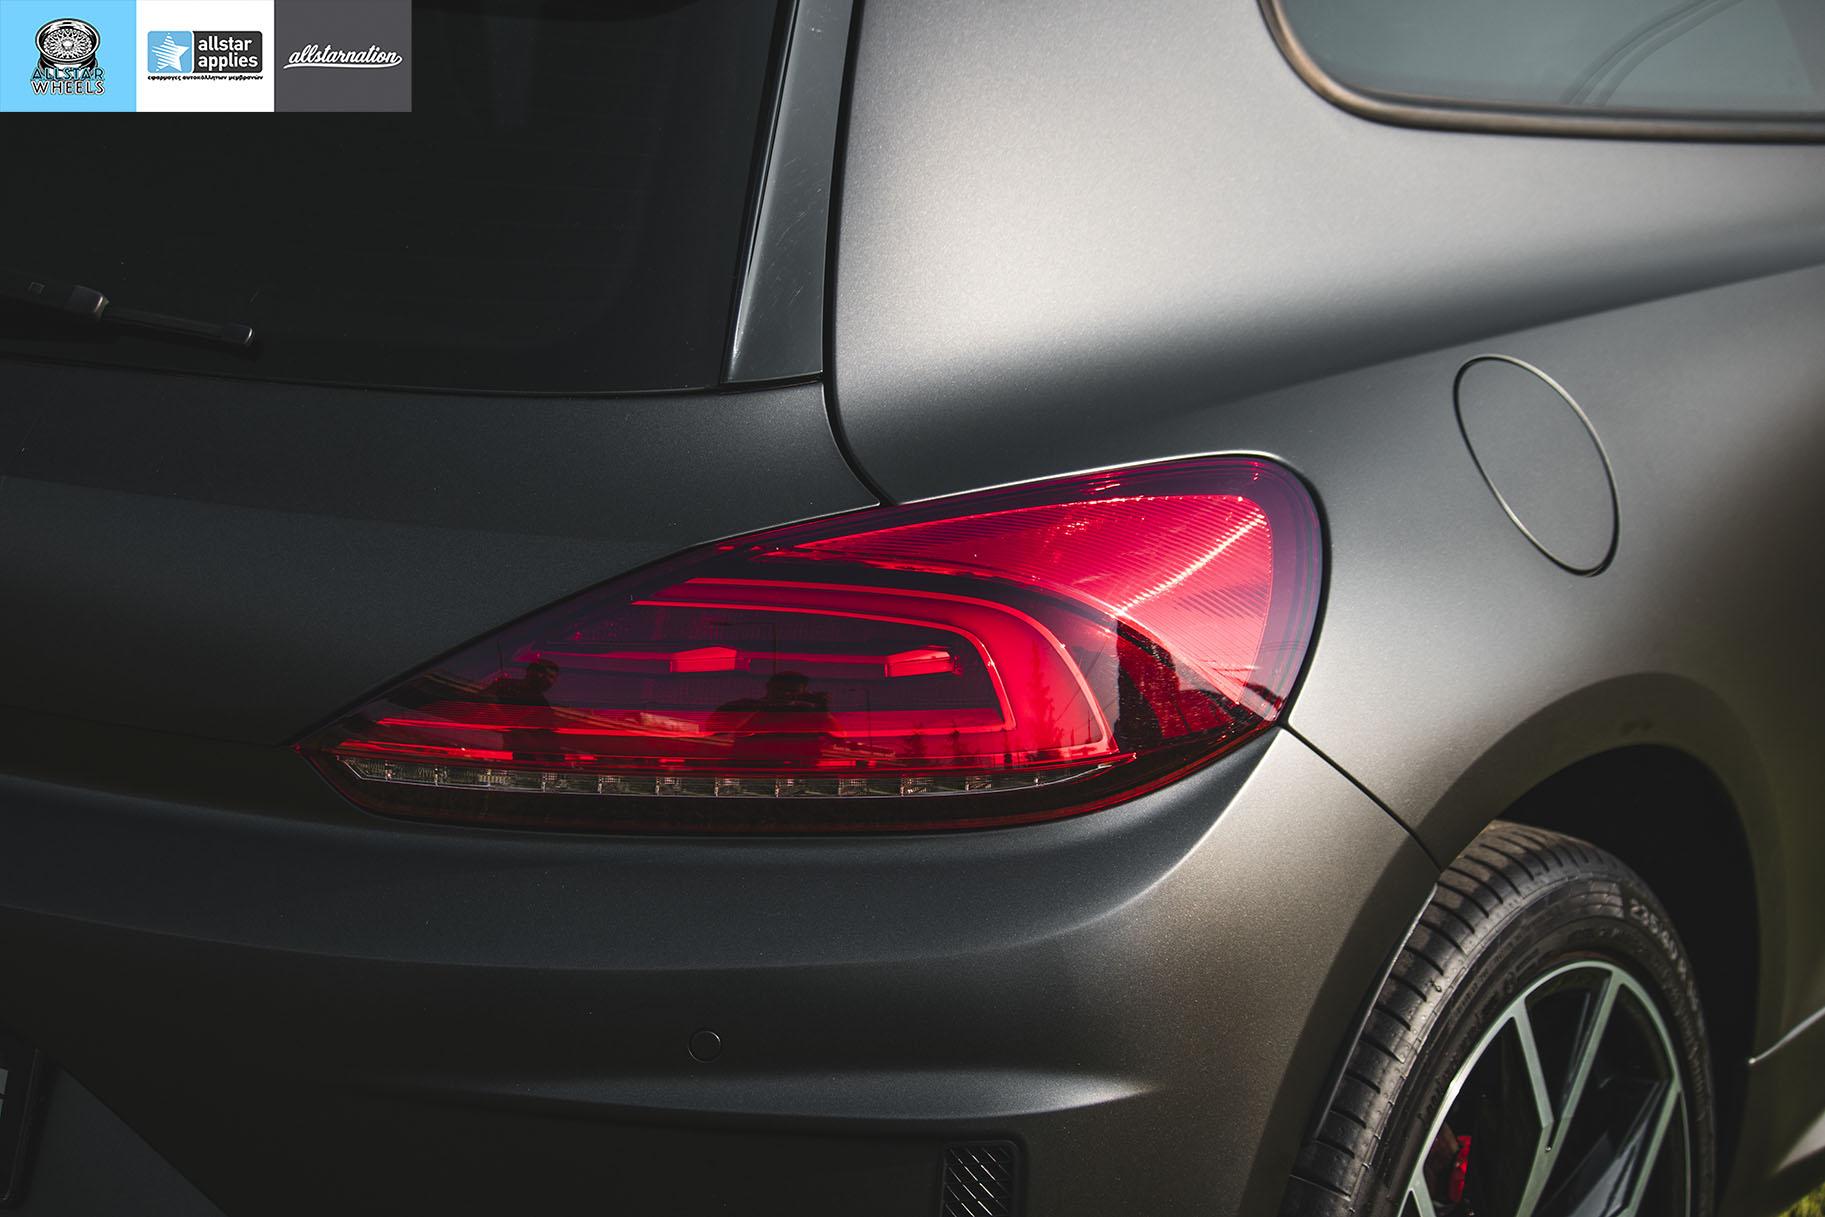 VW SCIROCCO MATT DIAMOND BLACK ALLSTAR APPLIES (10)